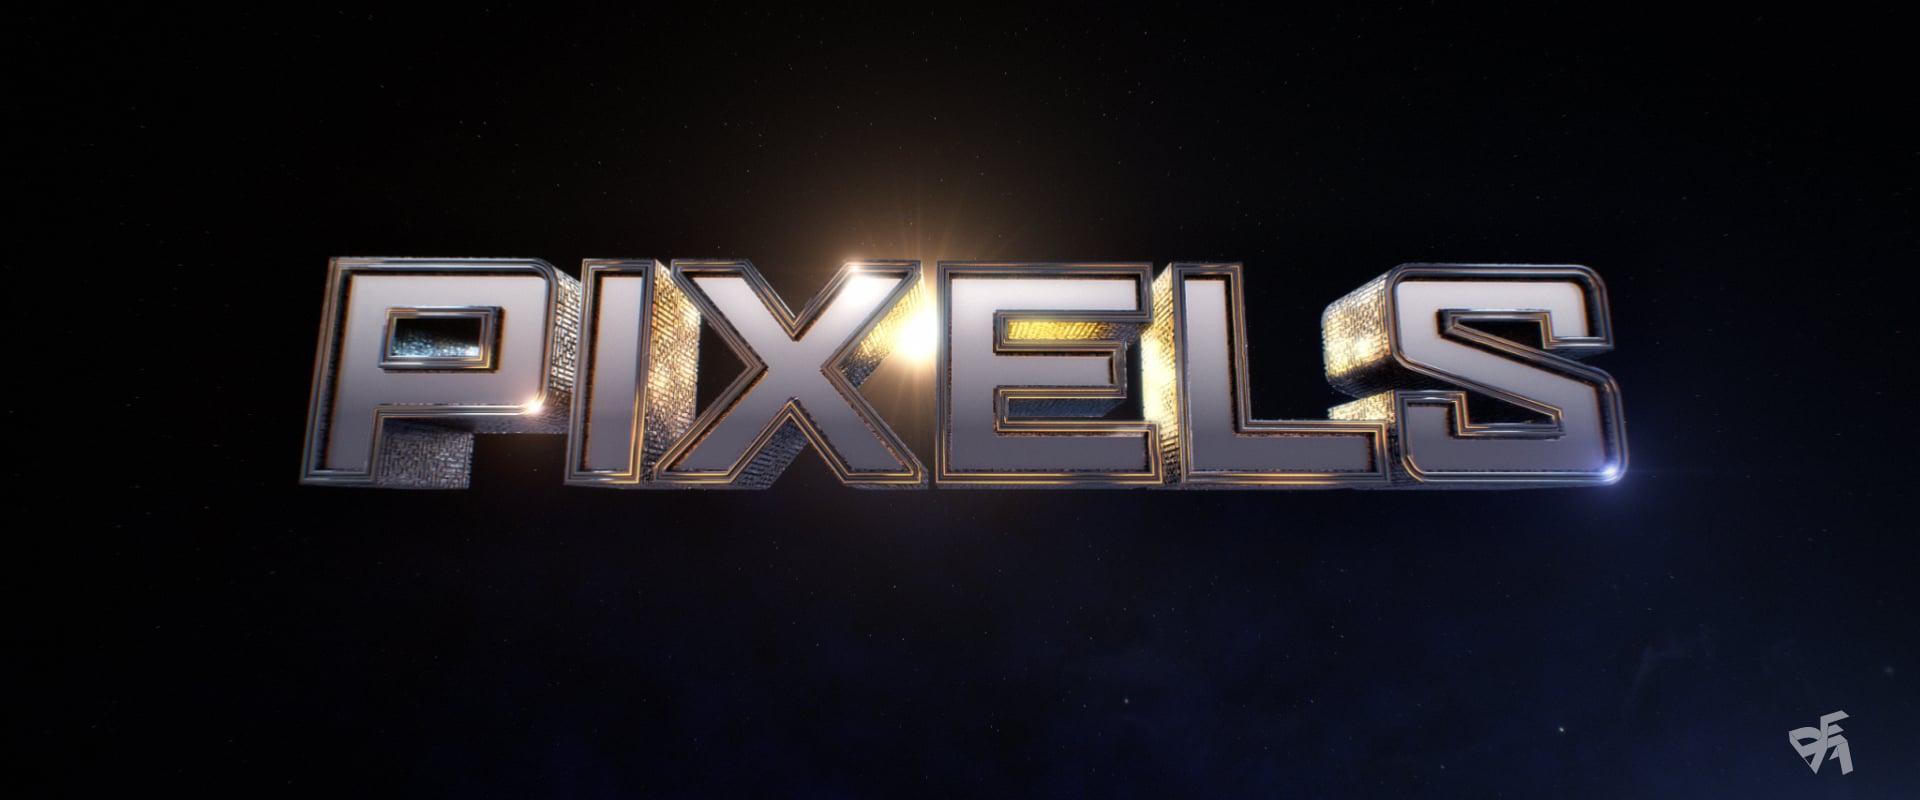 Pixels-STYLEFRAME_01.jpg